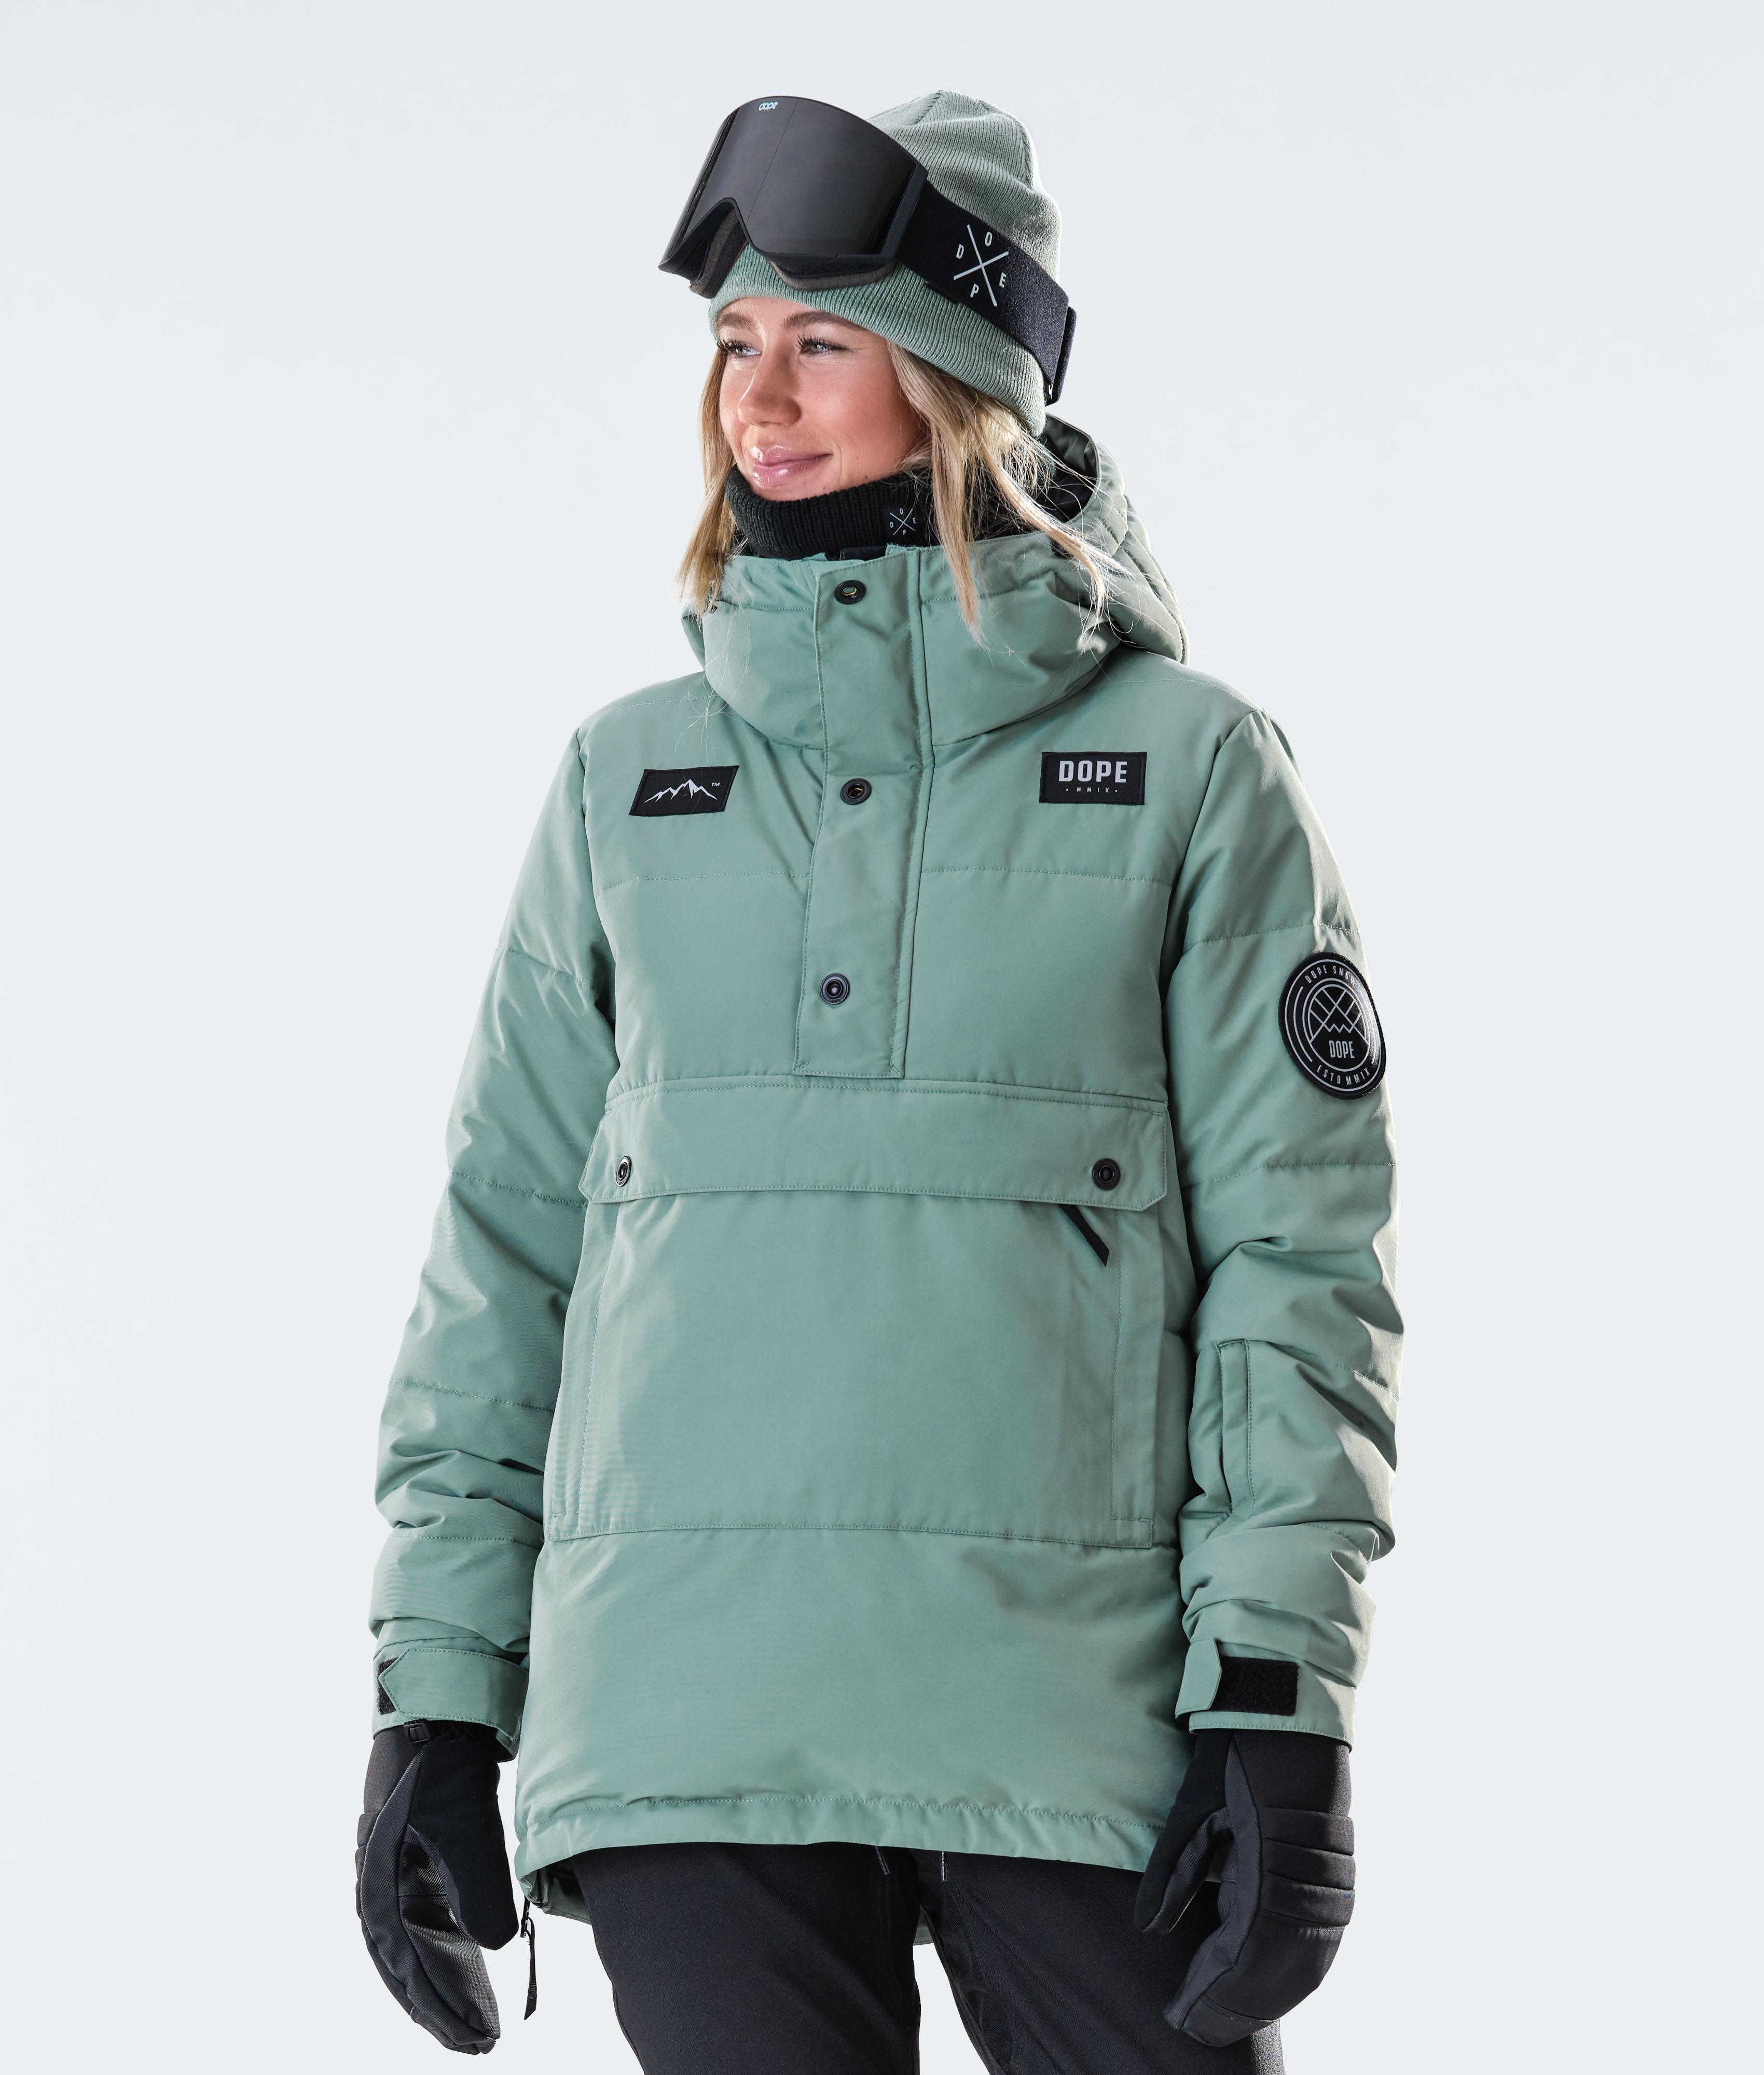 Dope Blizzard PO Snowboardjakke Faded Green Ridestore.no